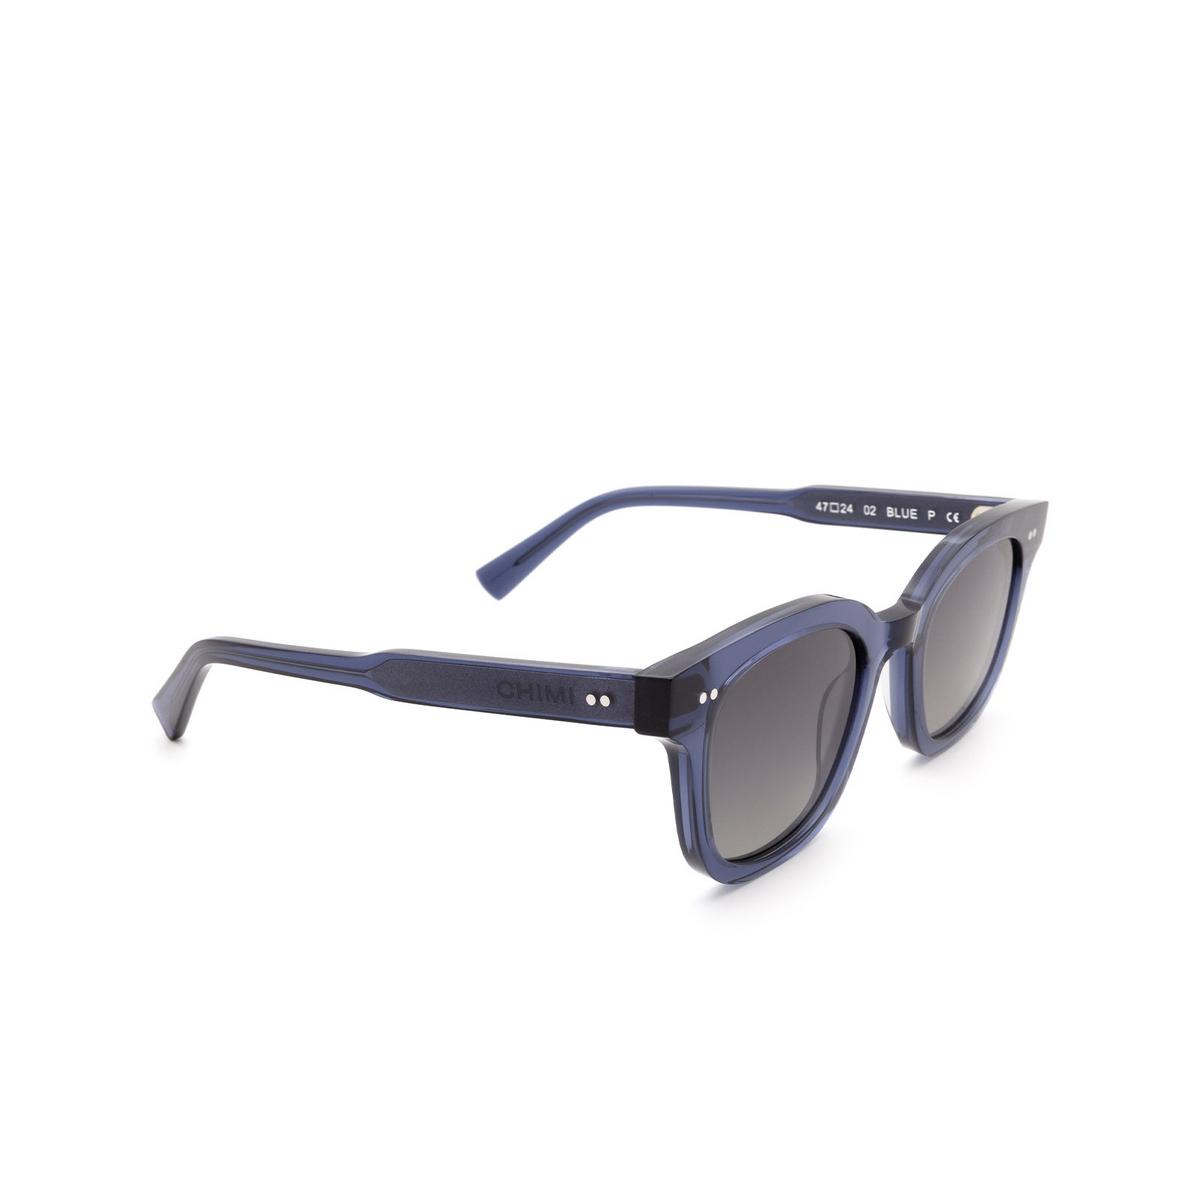 Chimi® Square Sunglasses: 02 color Blue - three-quarters view.